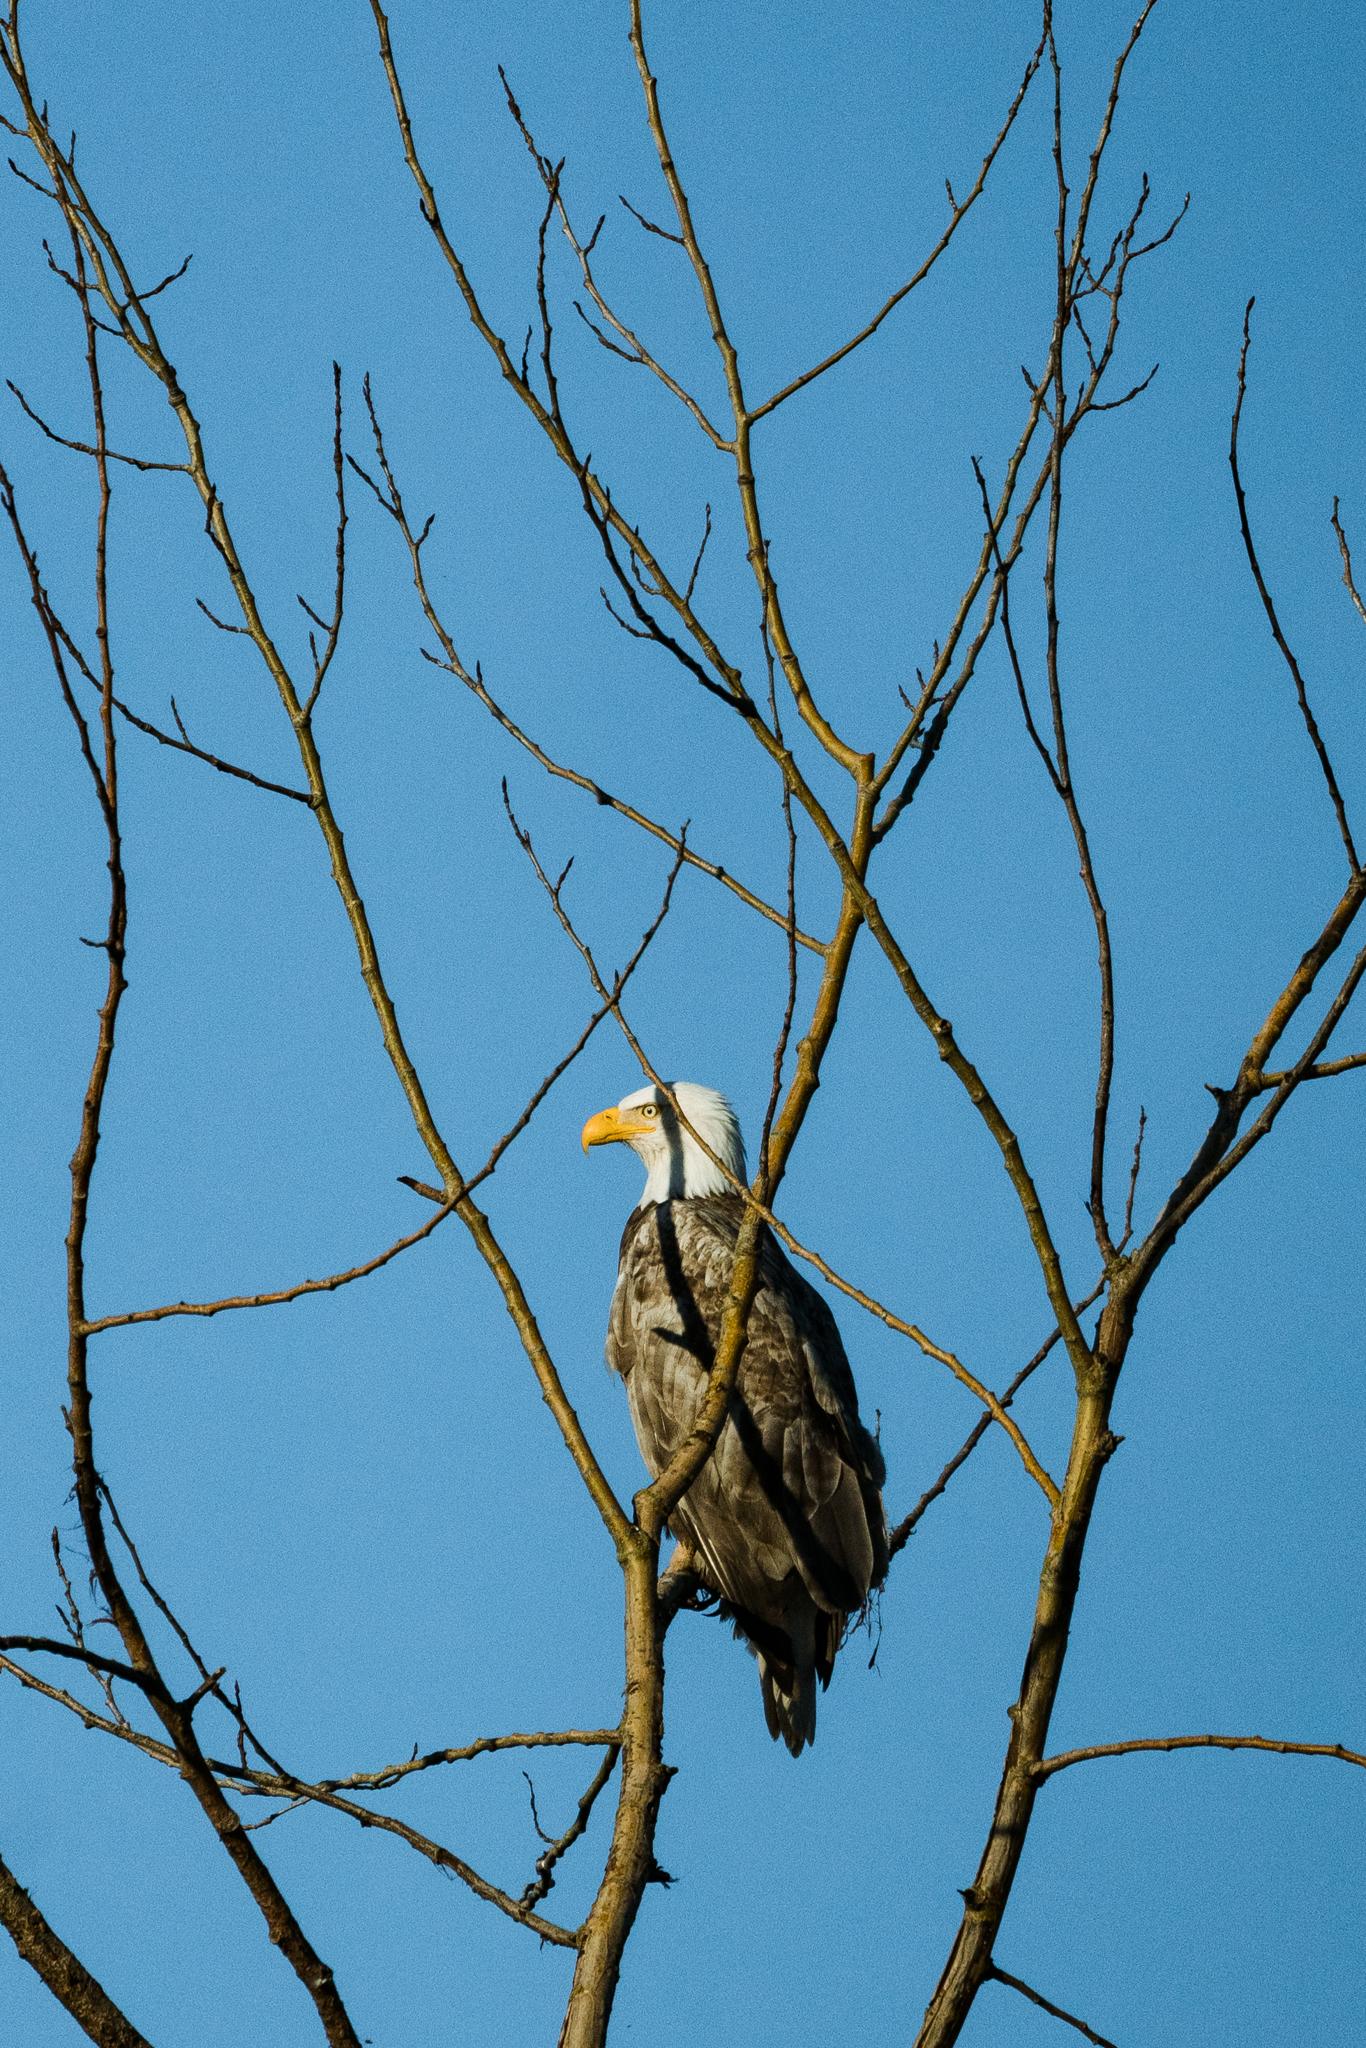 Photograph of a partially leucistic bald eagle in Washington state